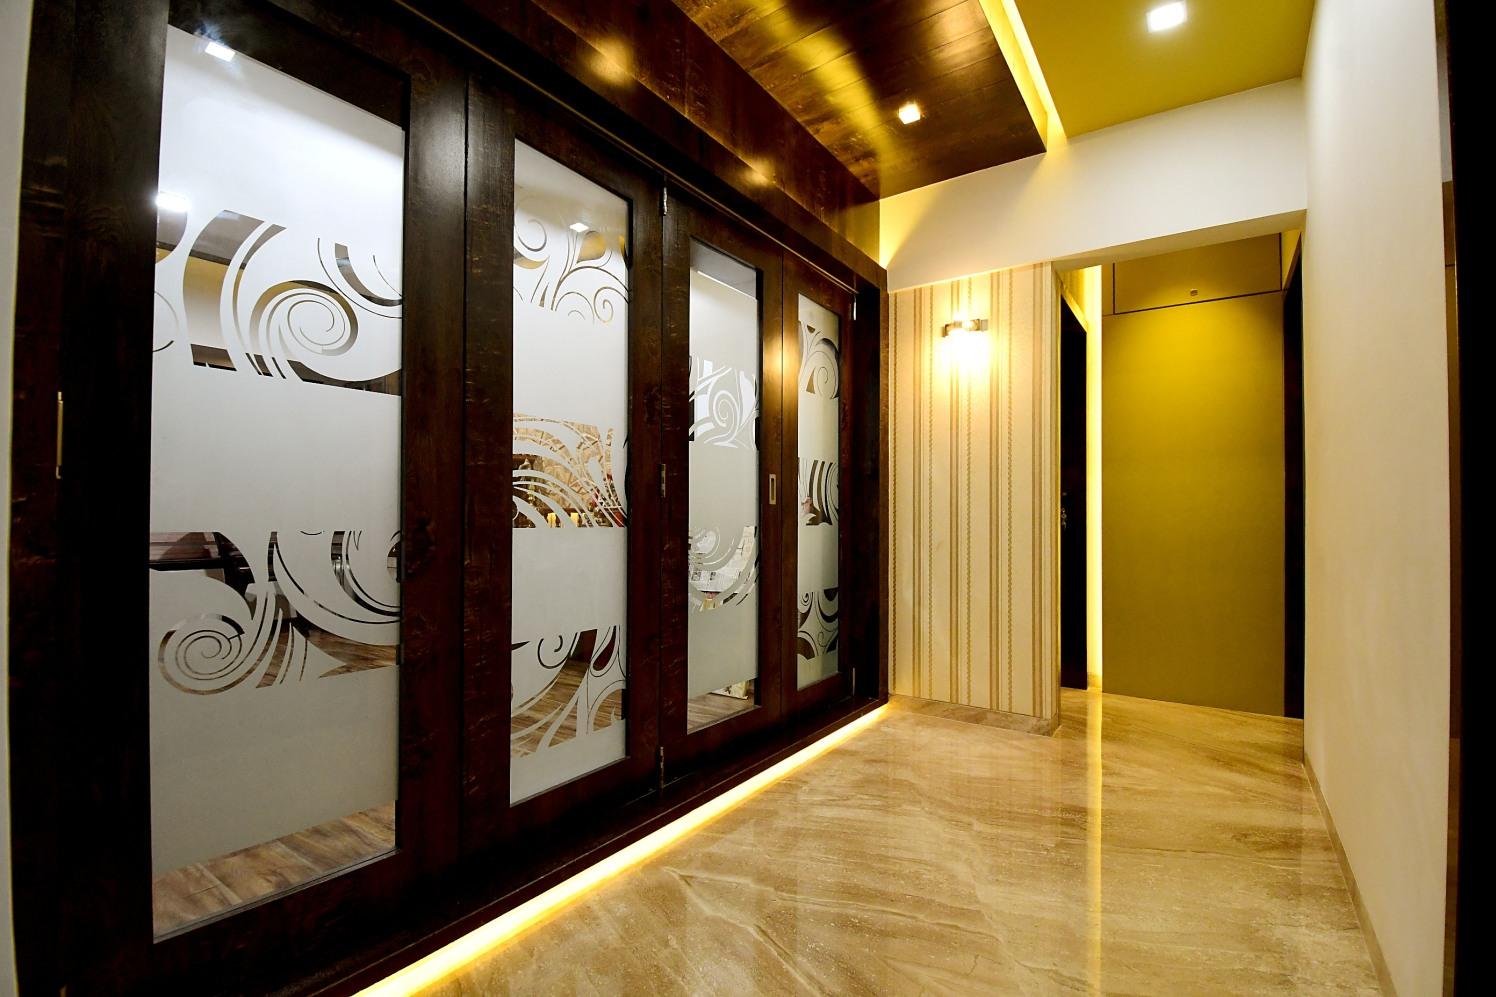 Marble Flooring With Glass Door In Hallway by Monika Bodkhe Indoor-spaces Modern | Interior Design Photos & Ideas